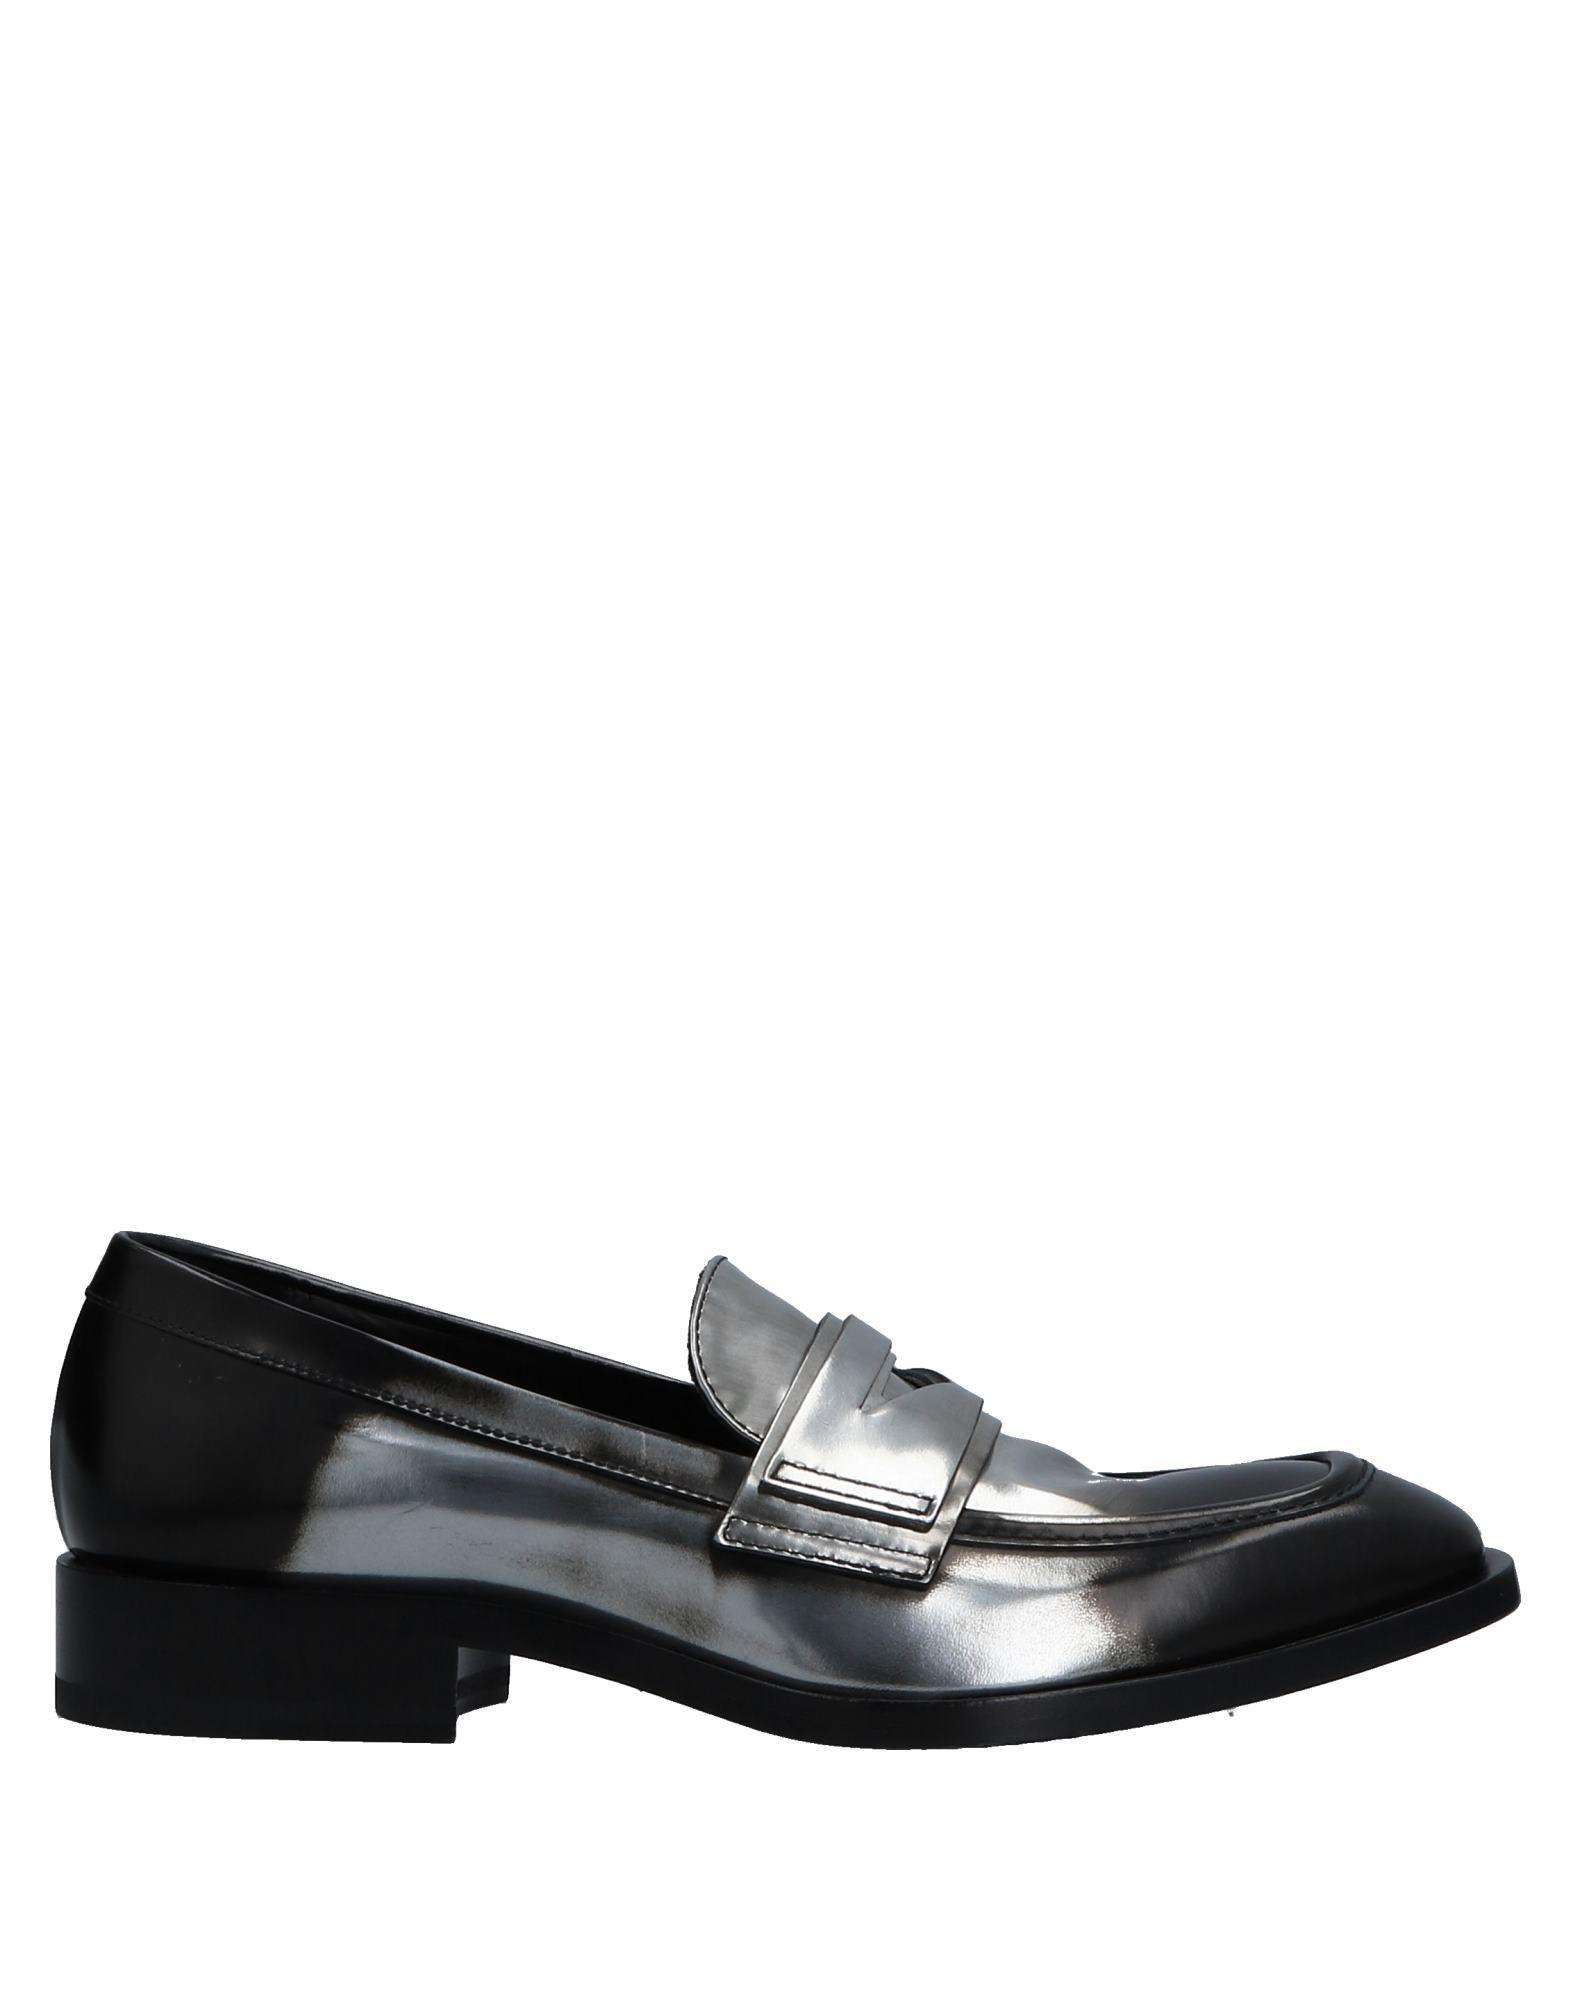 Jil Sander Mokassins Damen  11526873UPGünstige gut aussehende Schuhe